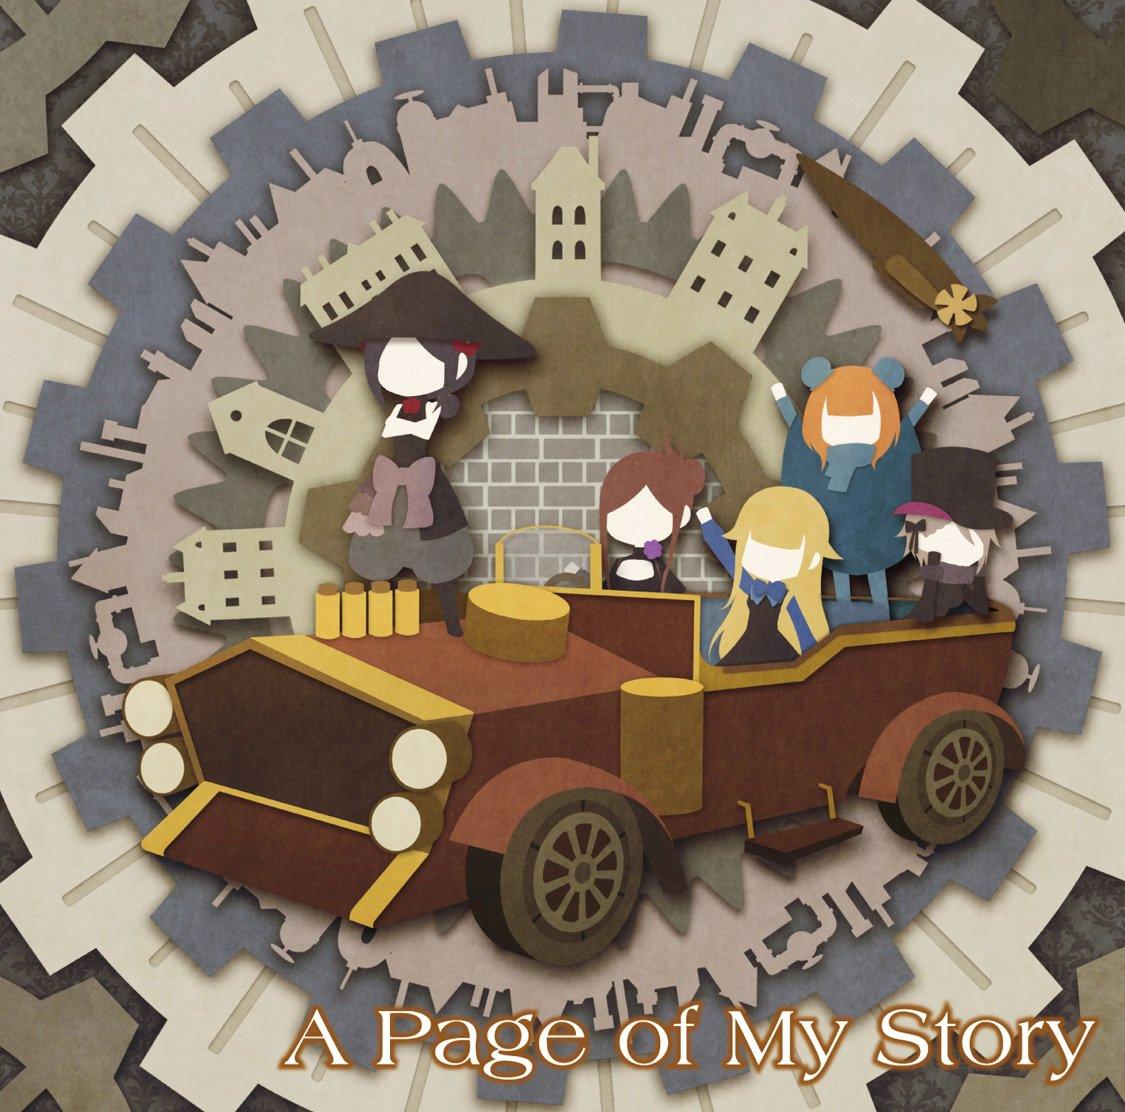 "test ツイッターメディア - #NowPlaying  ""A Page of My Story"" from ""A Page of My Story - Single"" (アンジェ (CV. 今村彩夏), プリンセス (CV. 関根明良), ドロシー (CV. 大地 葉), ベアトリス (CV. 影山 灯) & ちせ (CV. 古木のぞみ))  この曲がちでやばい 一生逃れられなくなった https://t.co/g6vGLuc2pn"